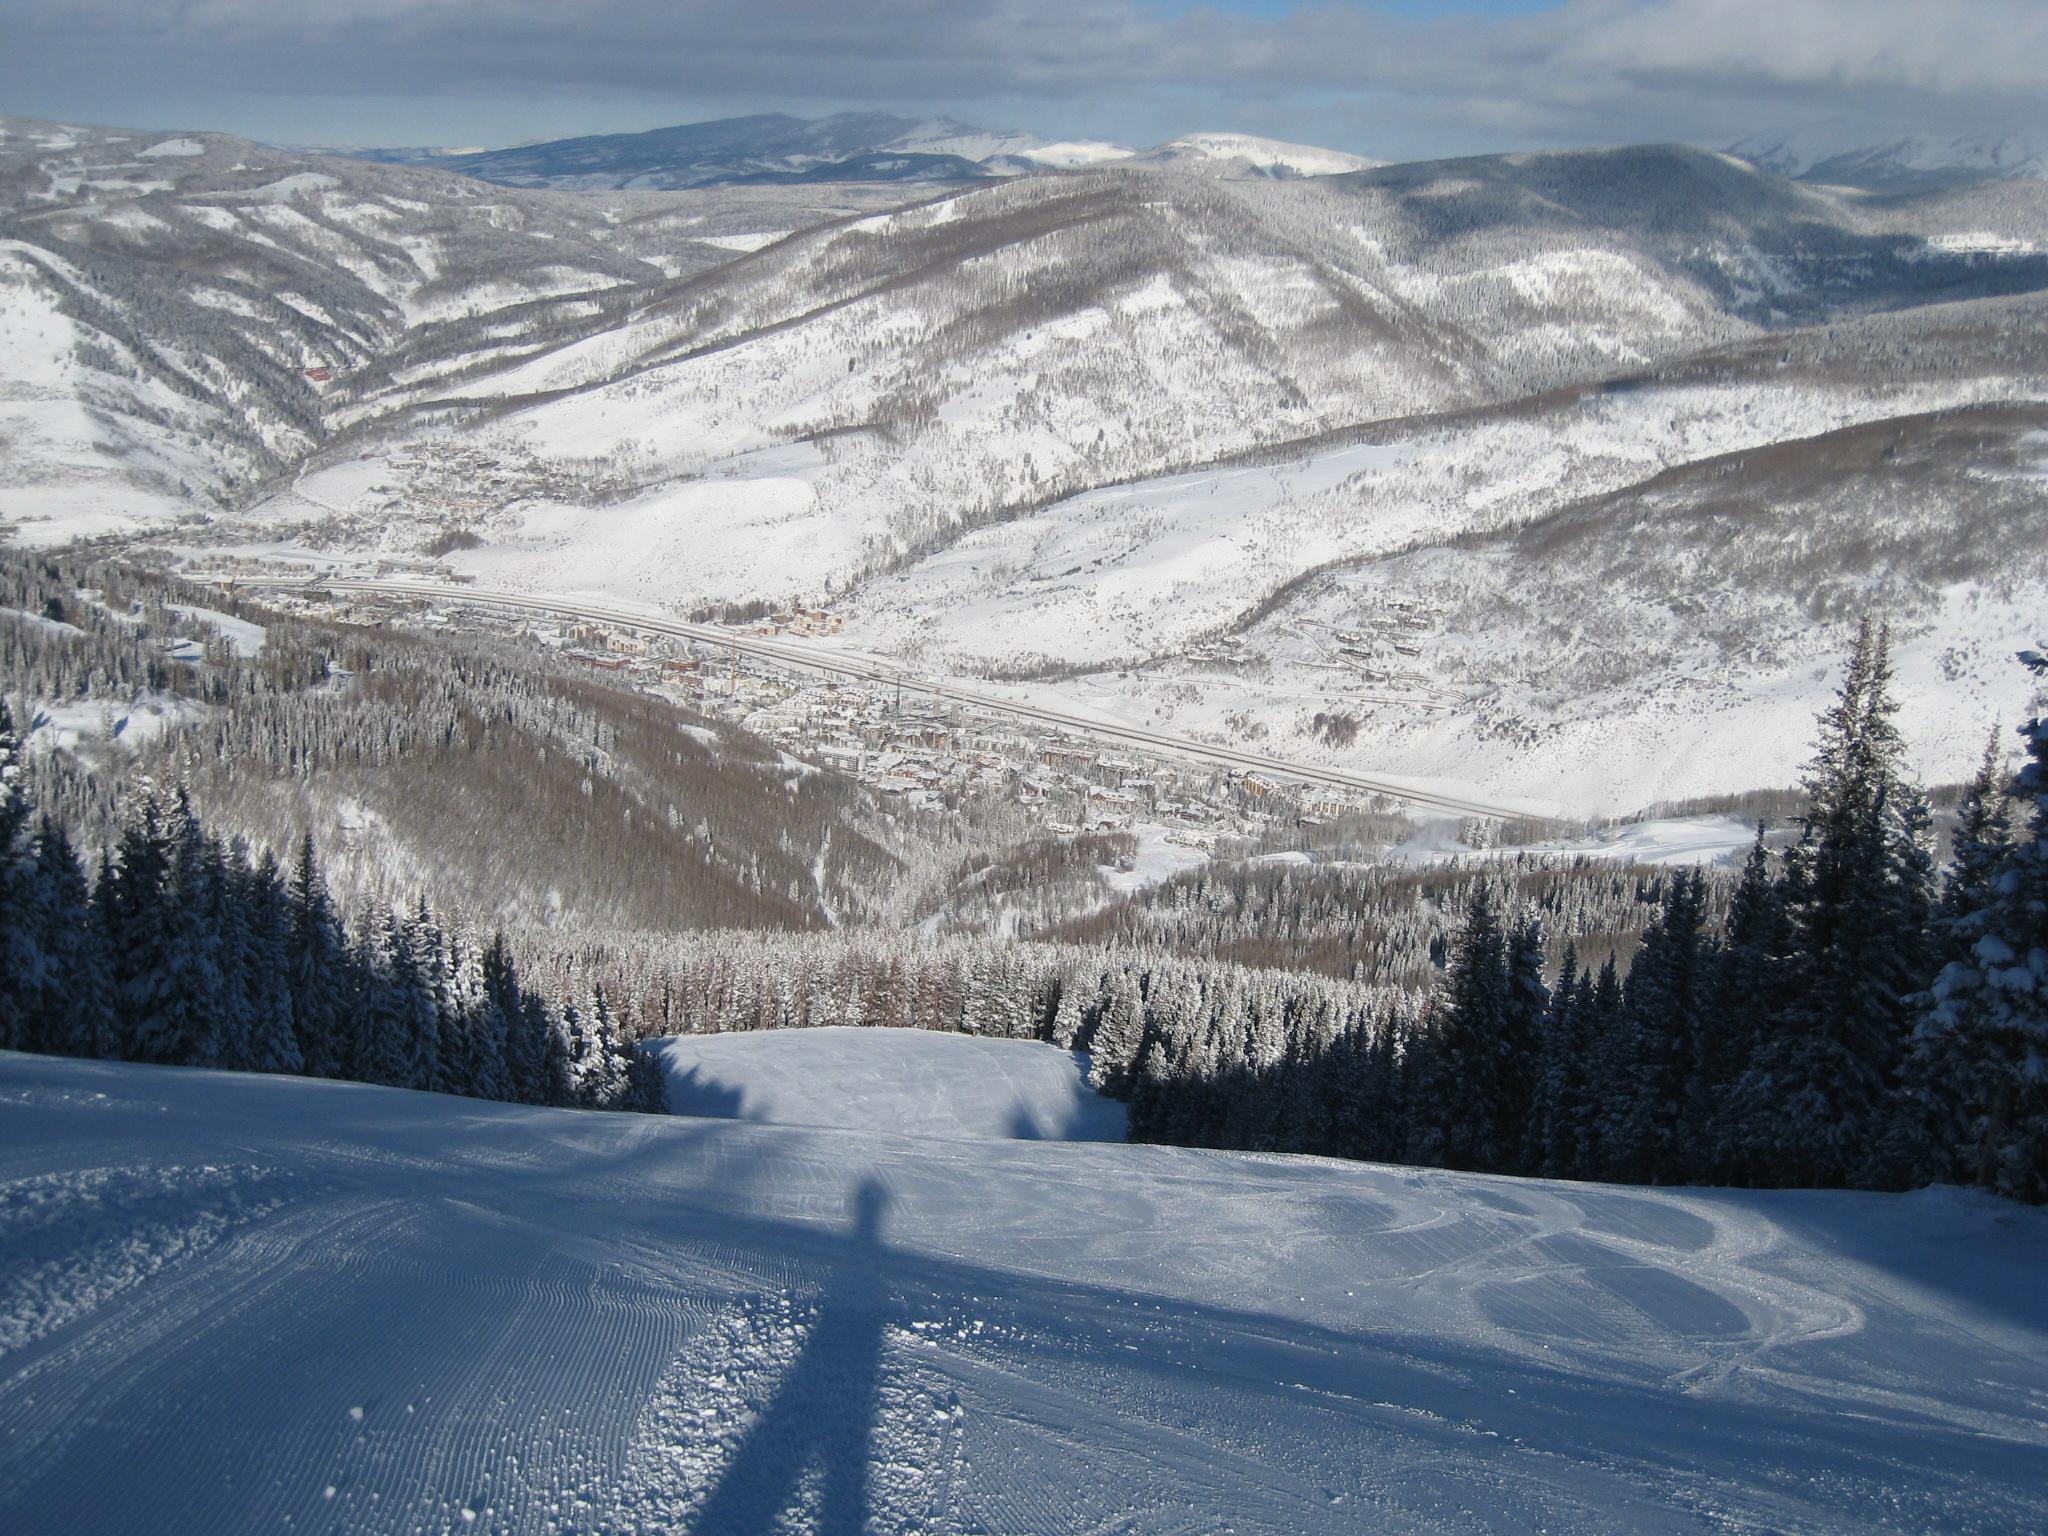 Riva Ridge, December 2008